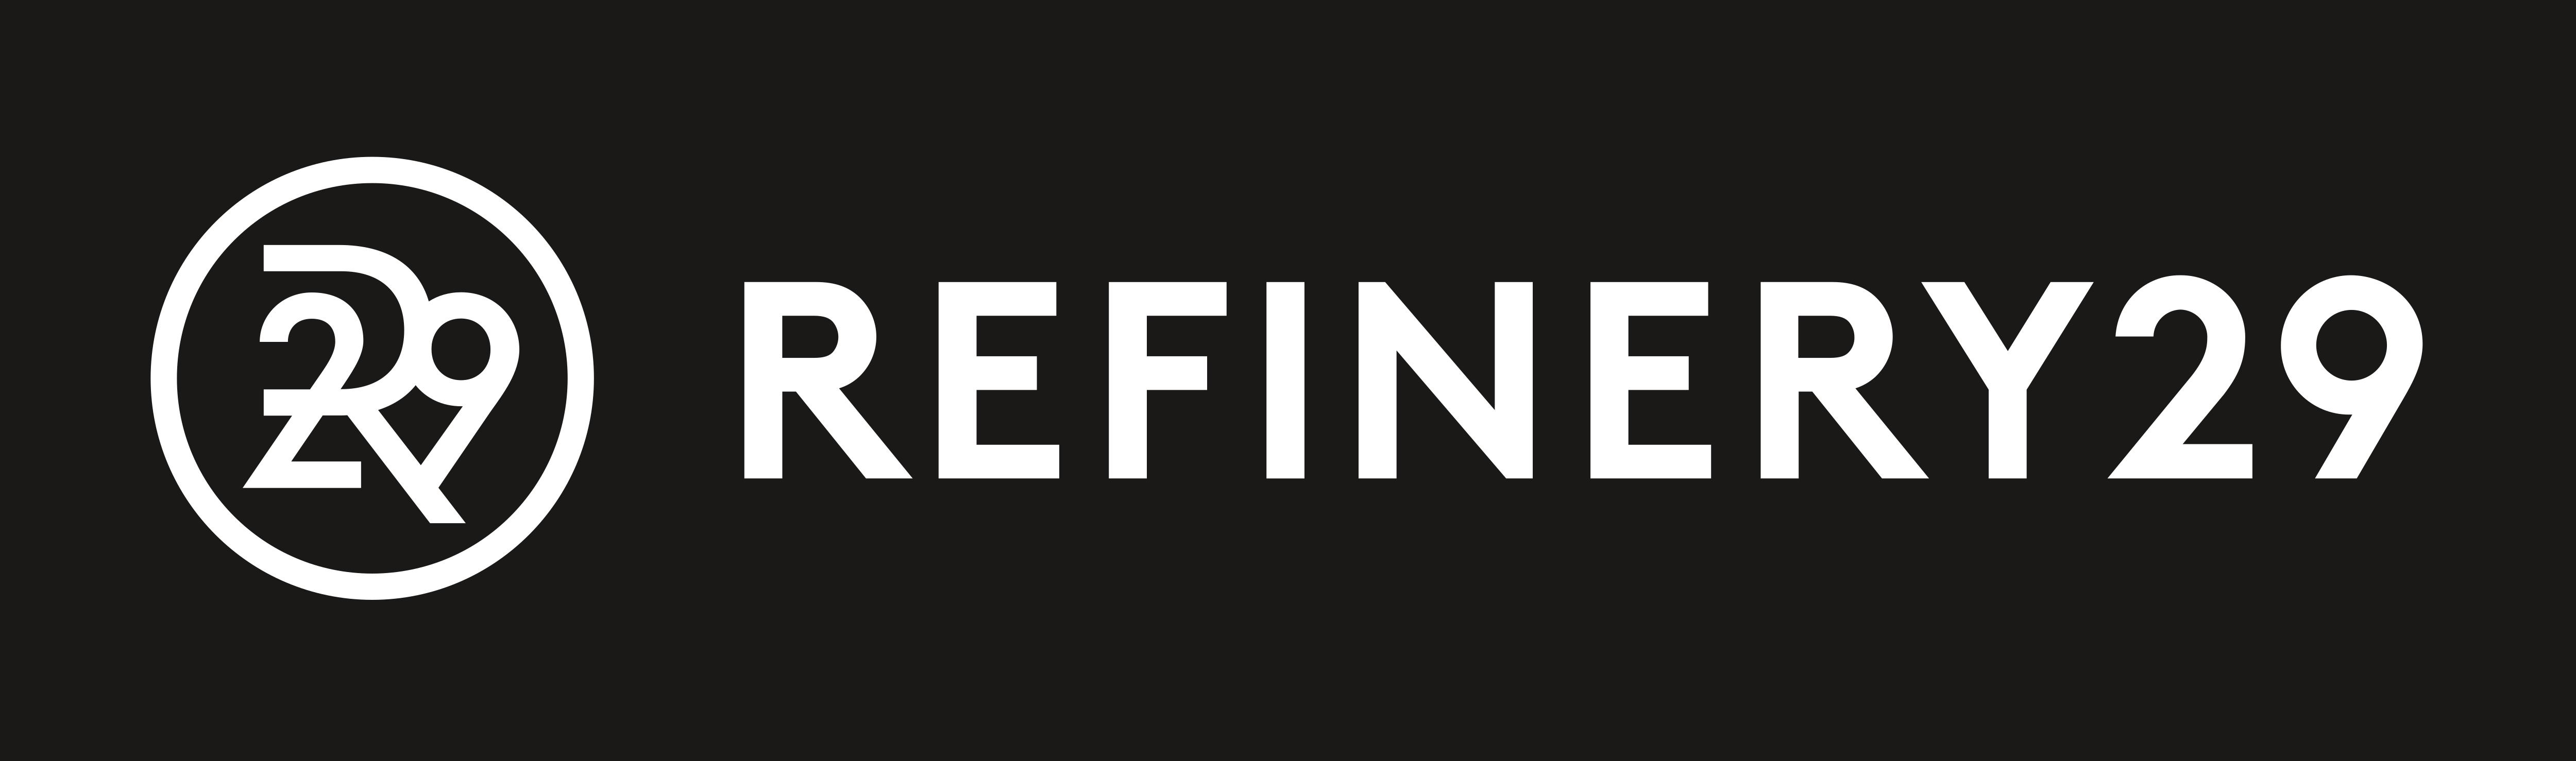 Refinery29_Logo